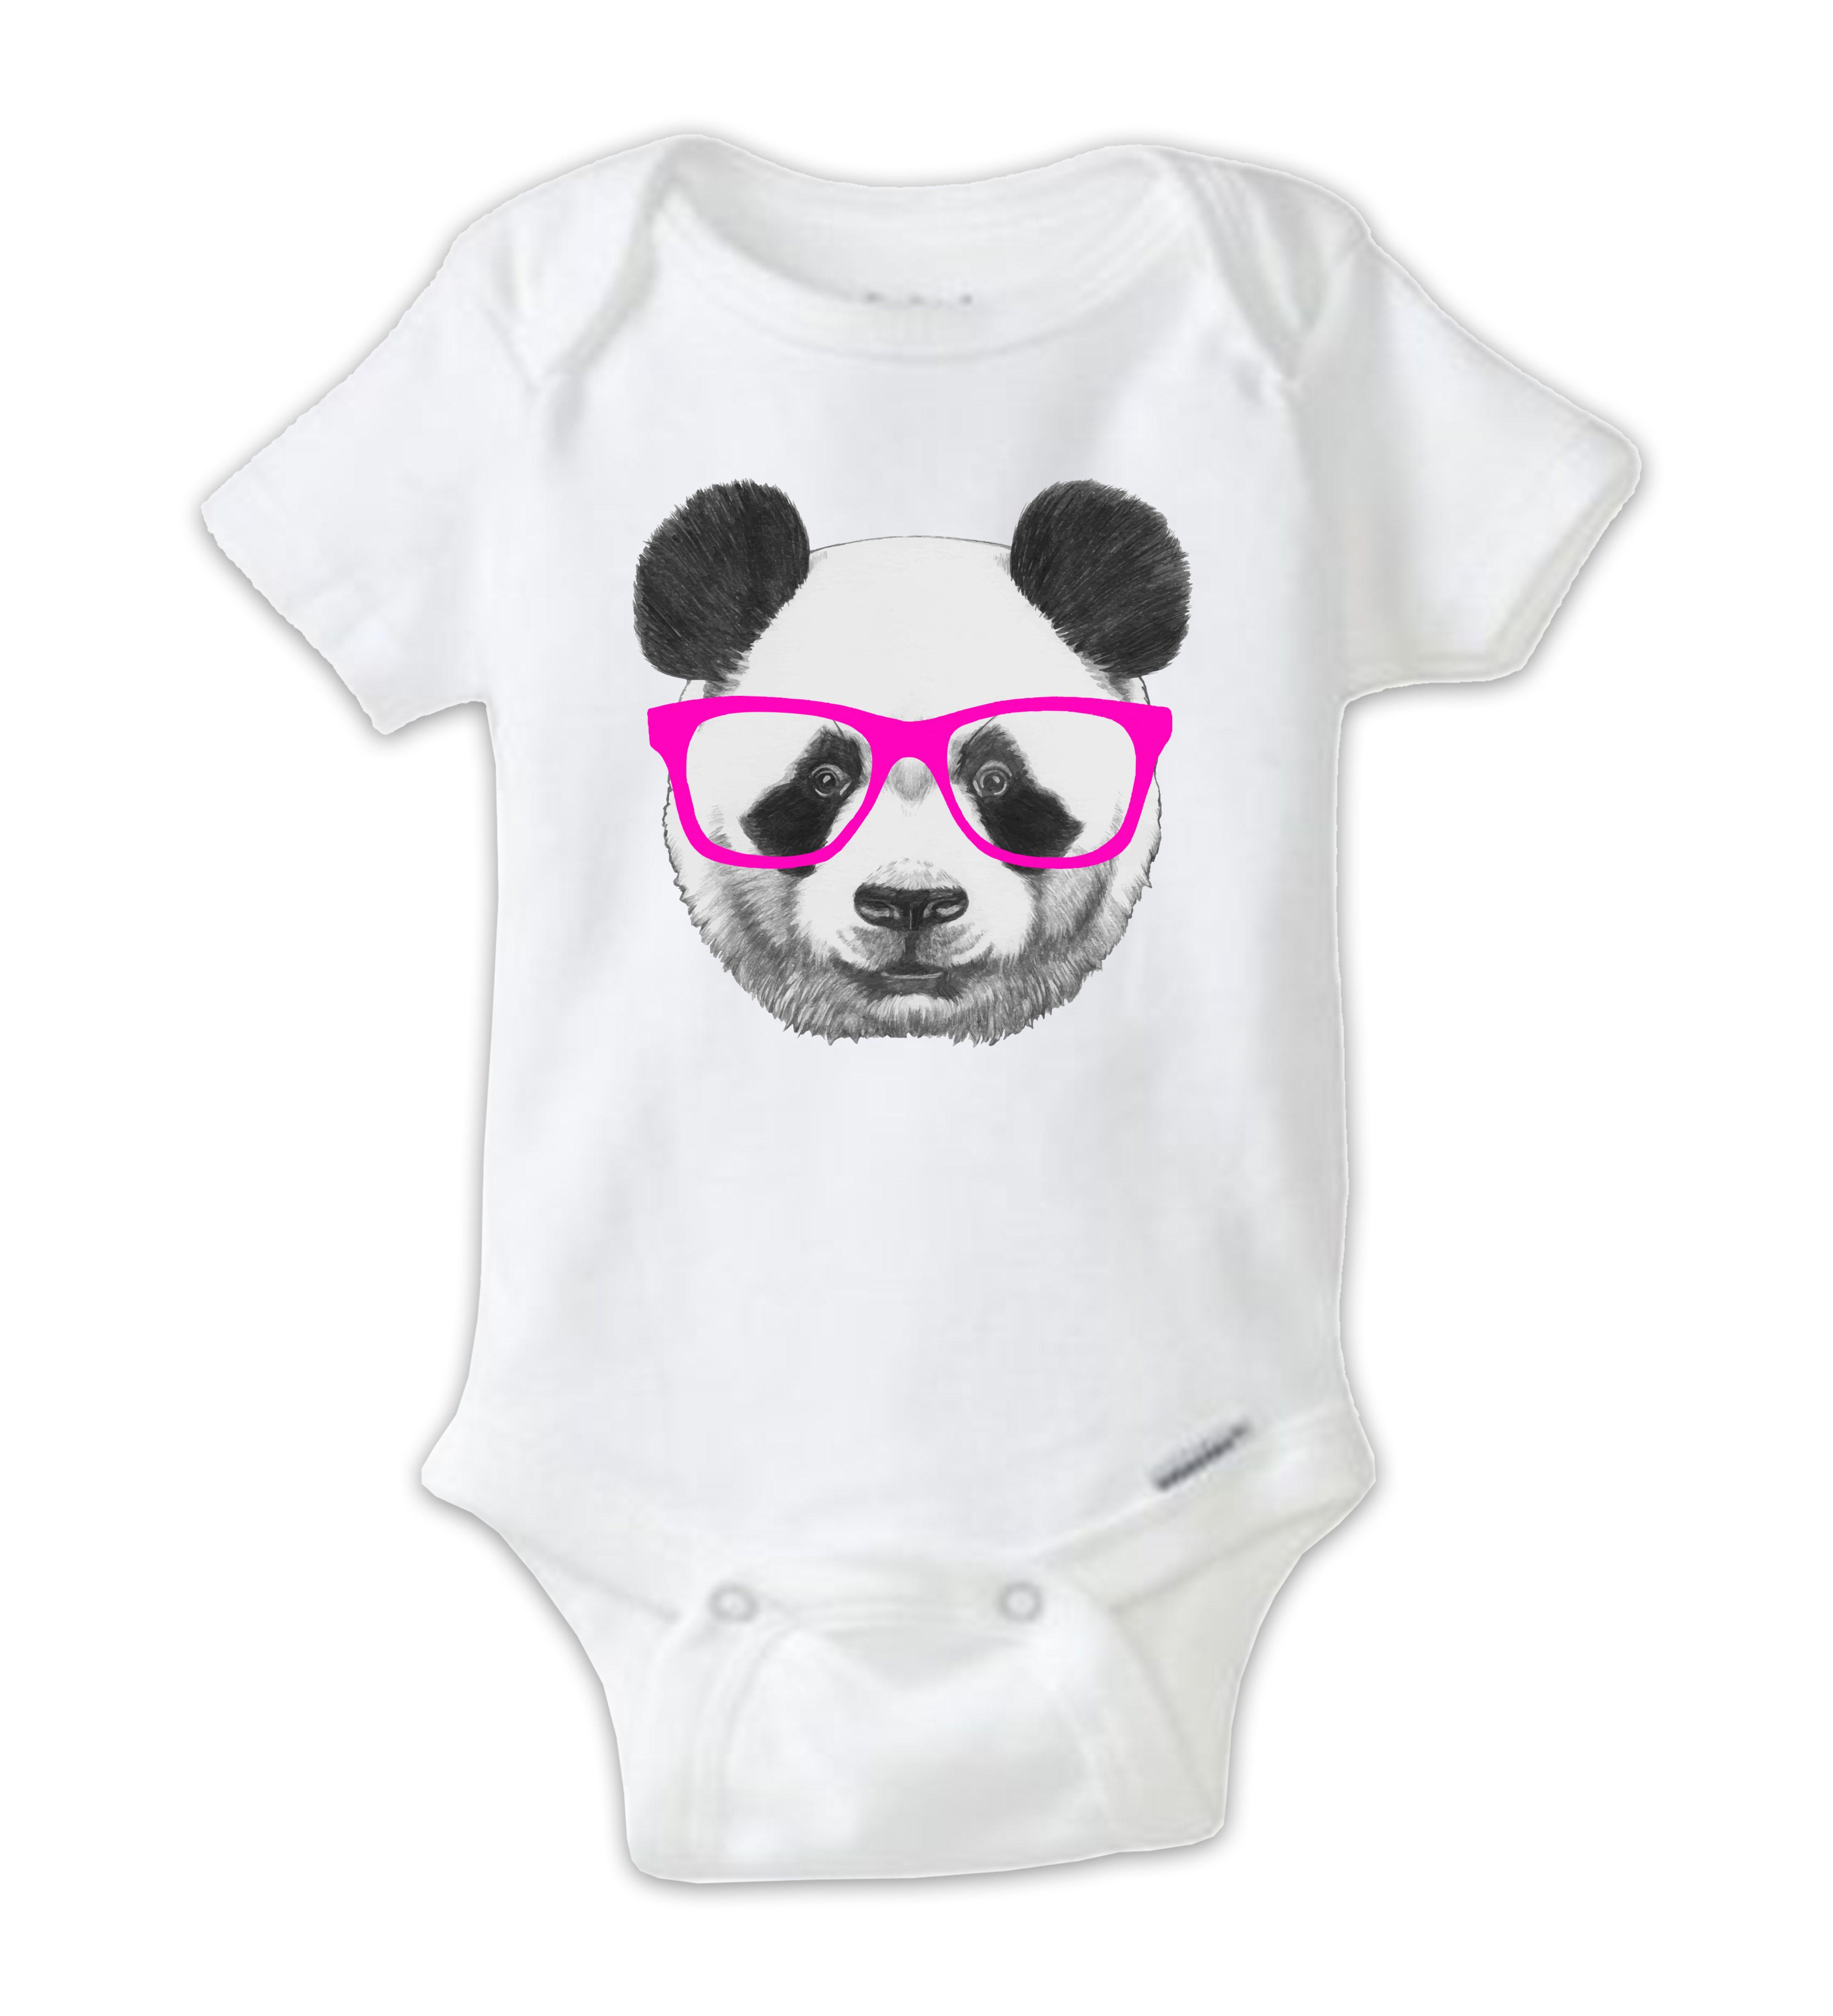 Cutepandaonesiepandanerdonesiehipsterbabybodysuitbaby babies clothes negle Gallery